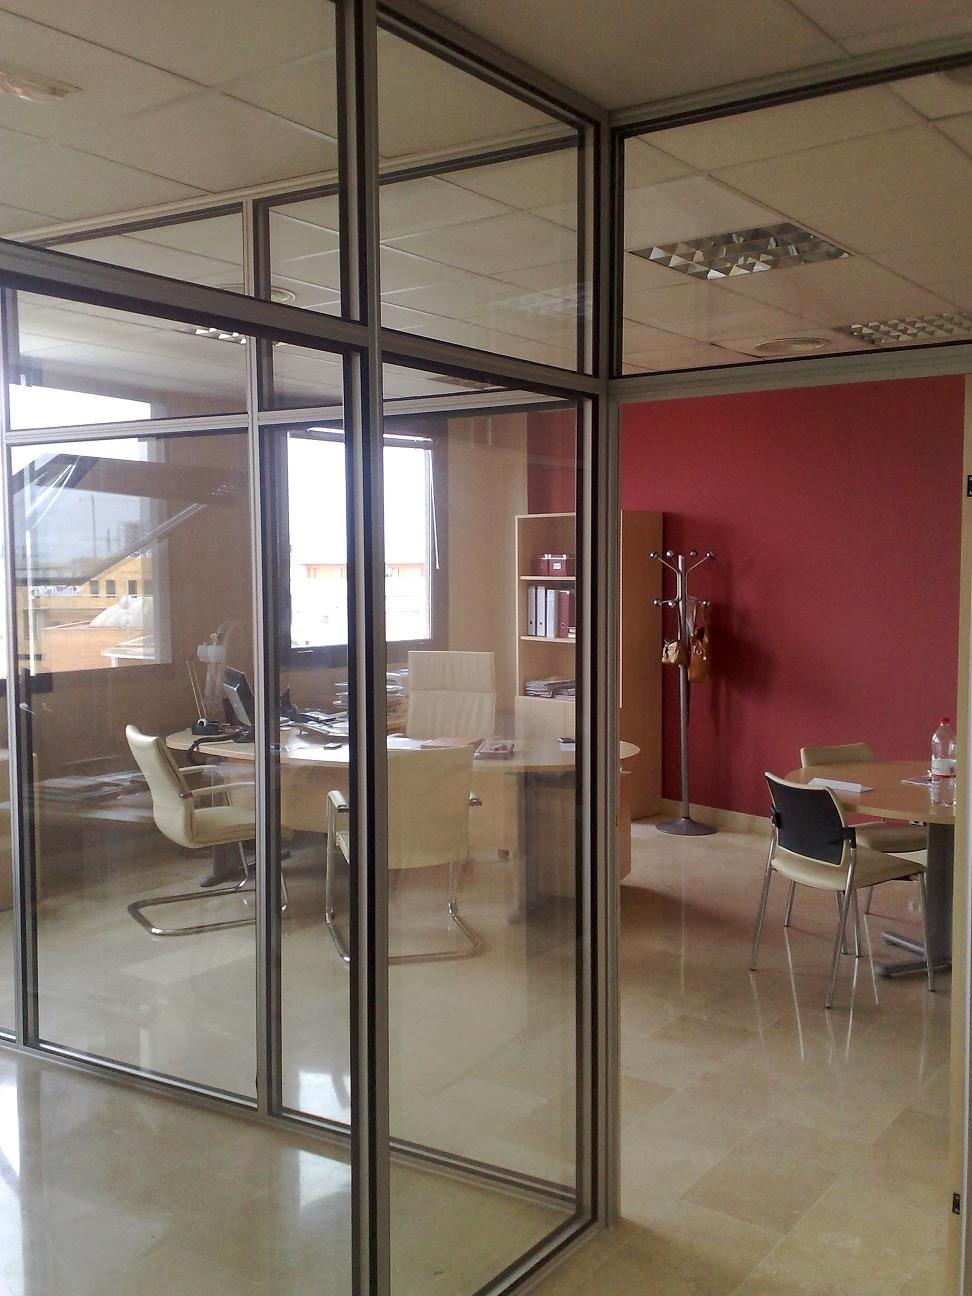 Mamparas de oficina dise o fabricaci n y montaje for Distribucion oficinas pequenas